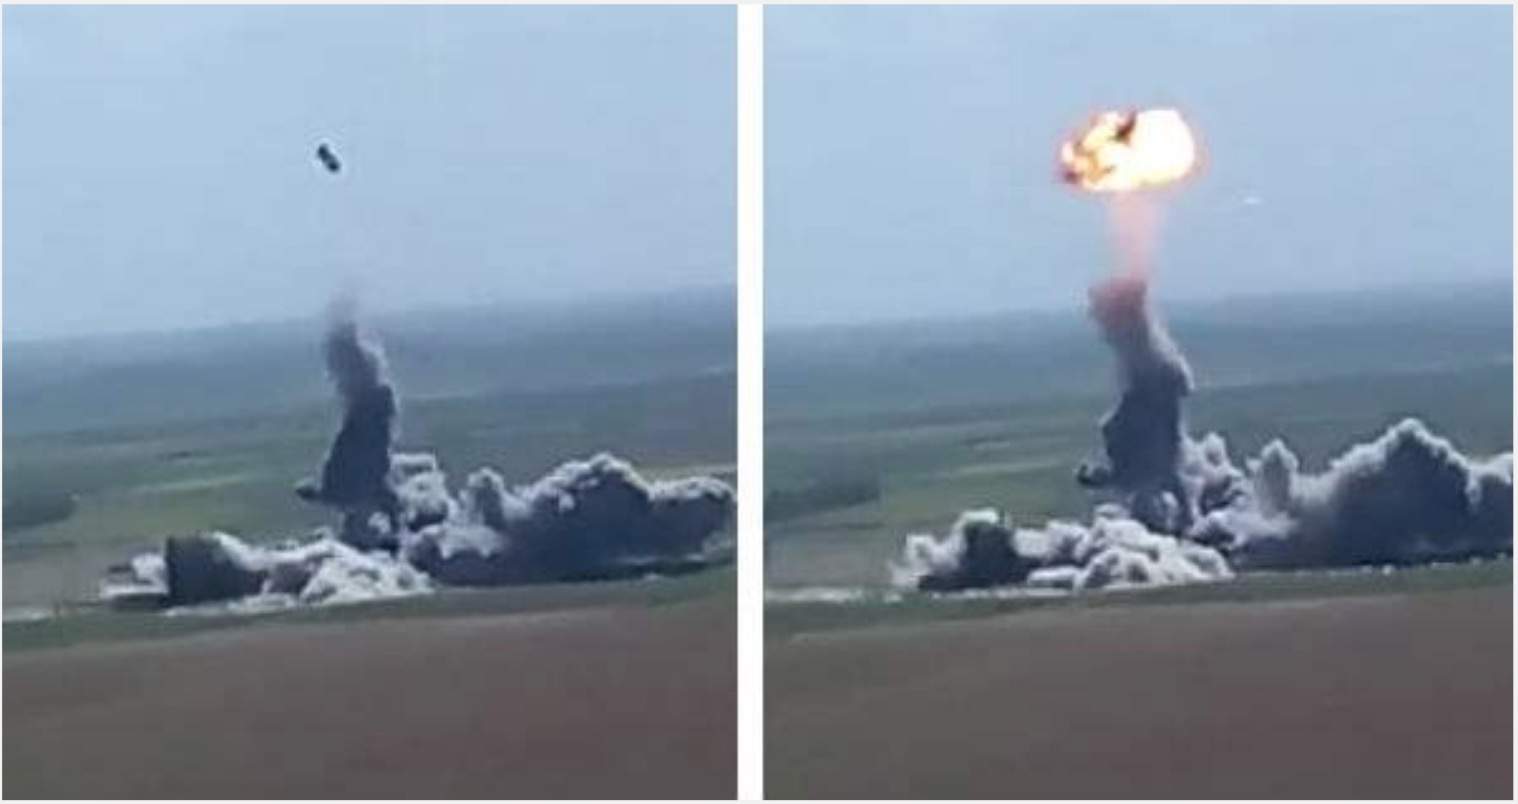 https://www.dreuz.info/wp-content/uploads/2017/09/Explosion-voiture-terroriste-dreuz.jpg